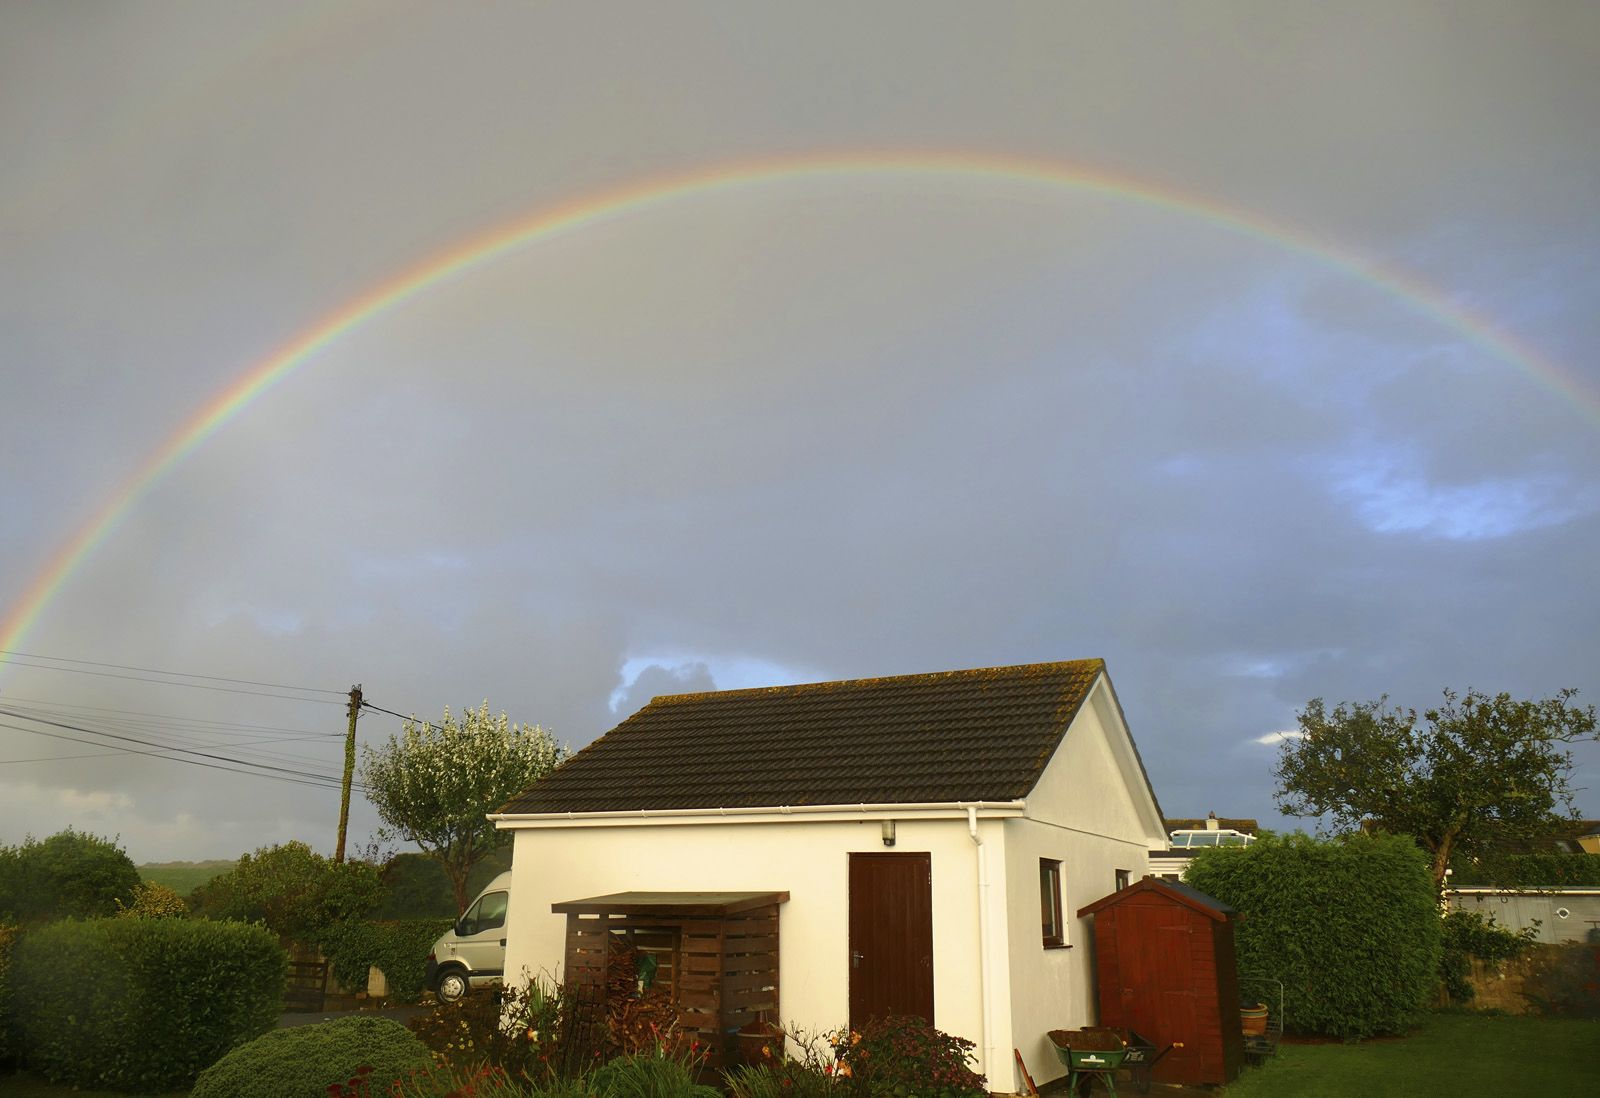 Somewhere over the garden - Ann Glinn